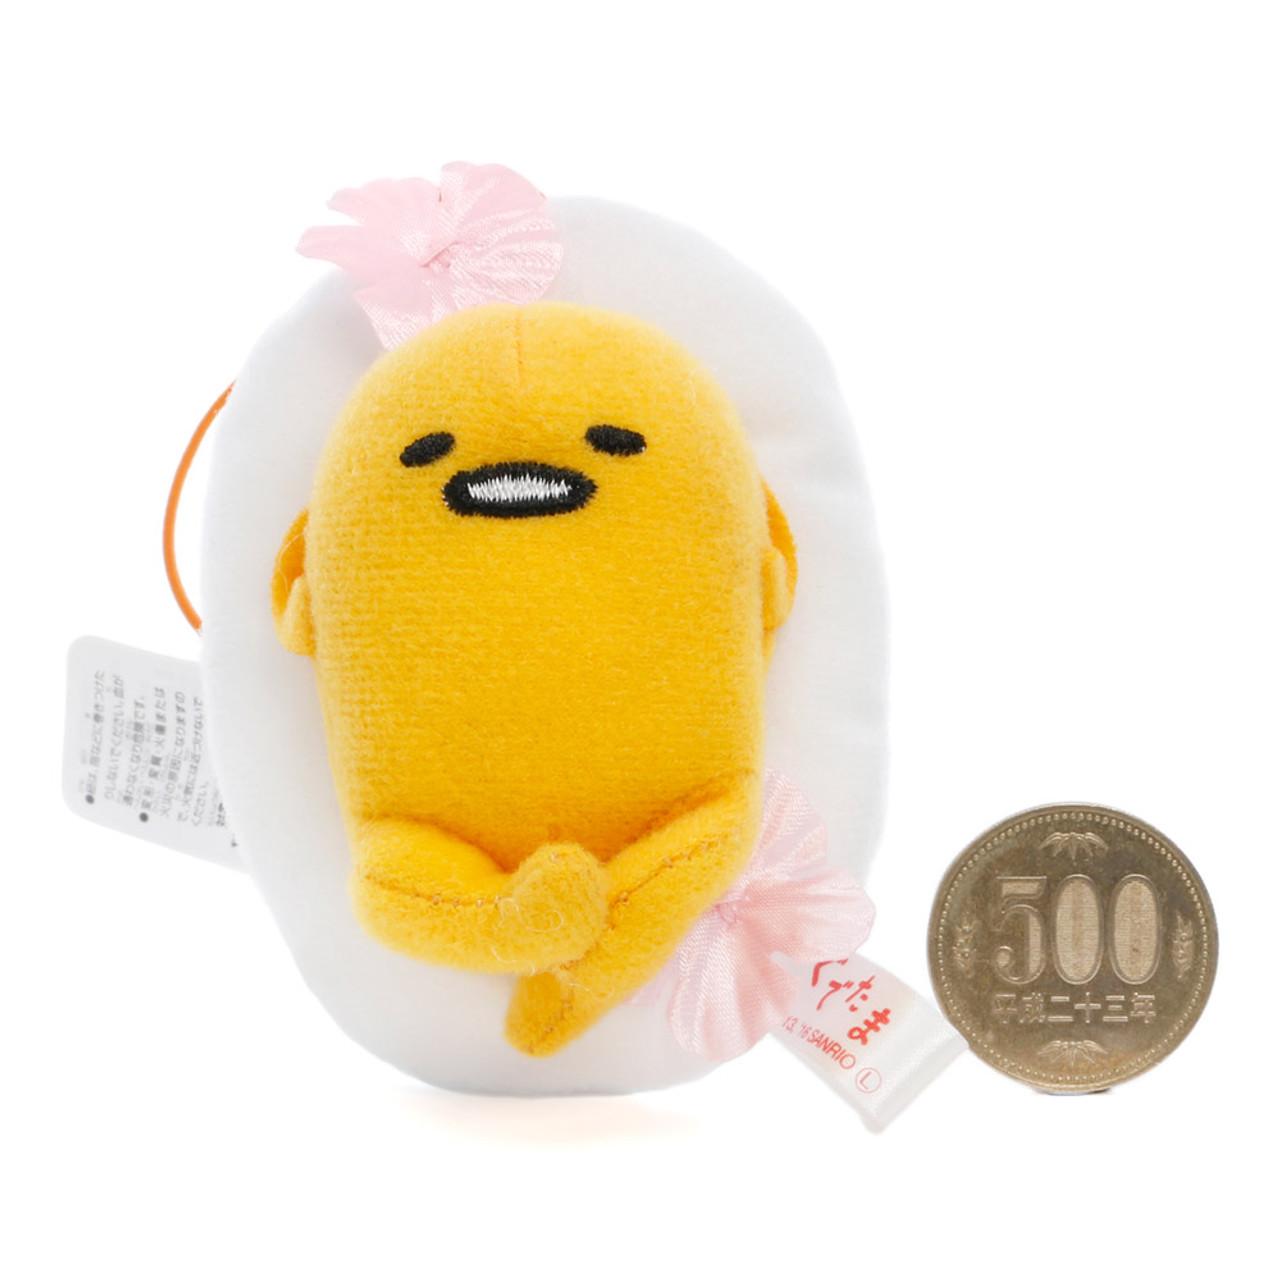 Sanrio Gudetama Lazy Egg Sakura Mascot Plush Charms - Lying On Sakura Egg White ( Proportion )